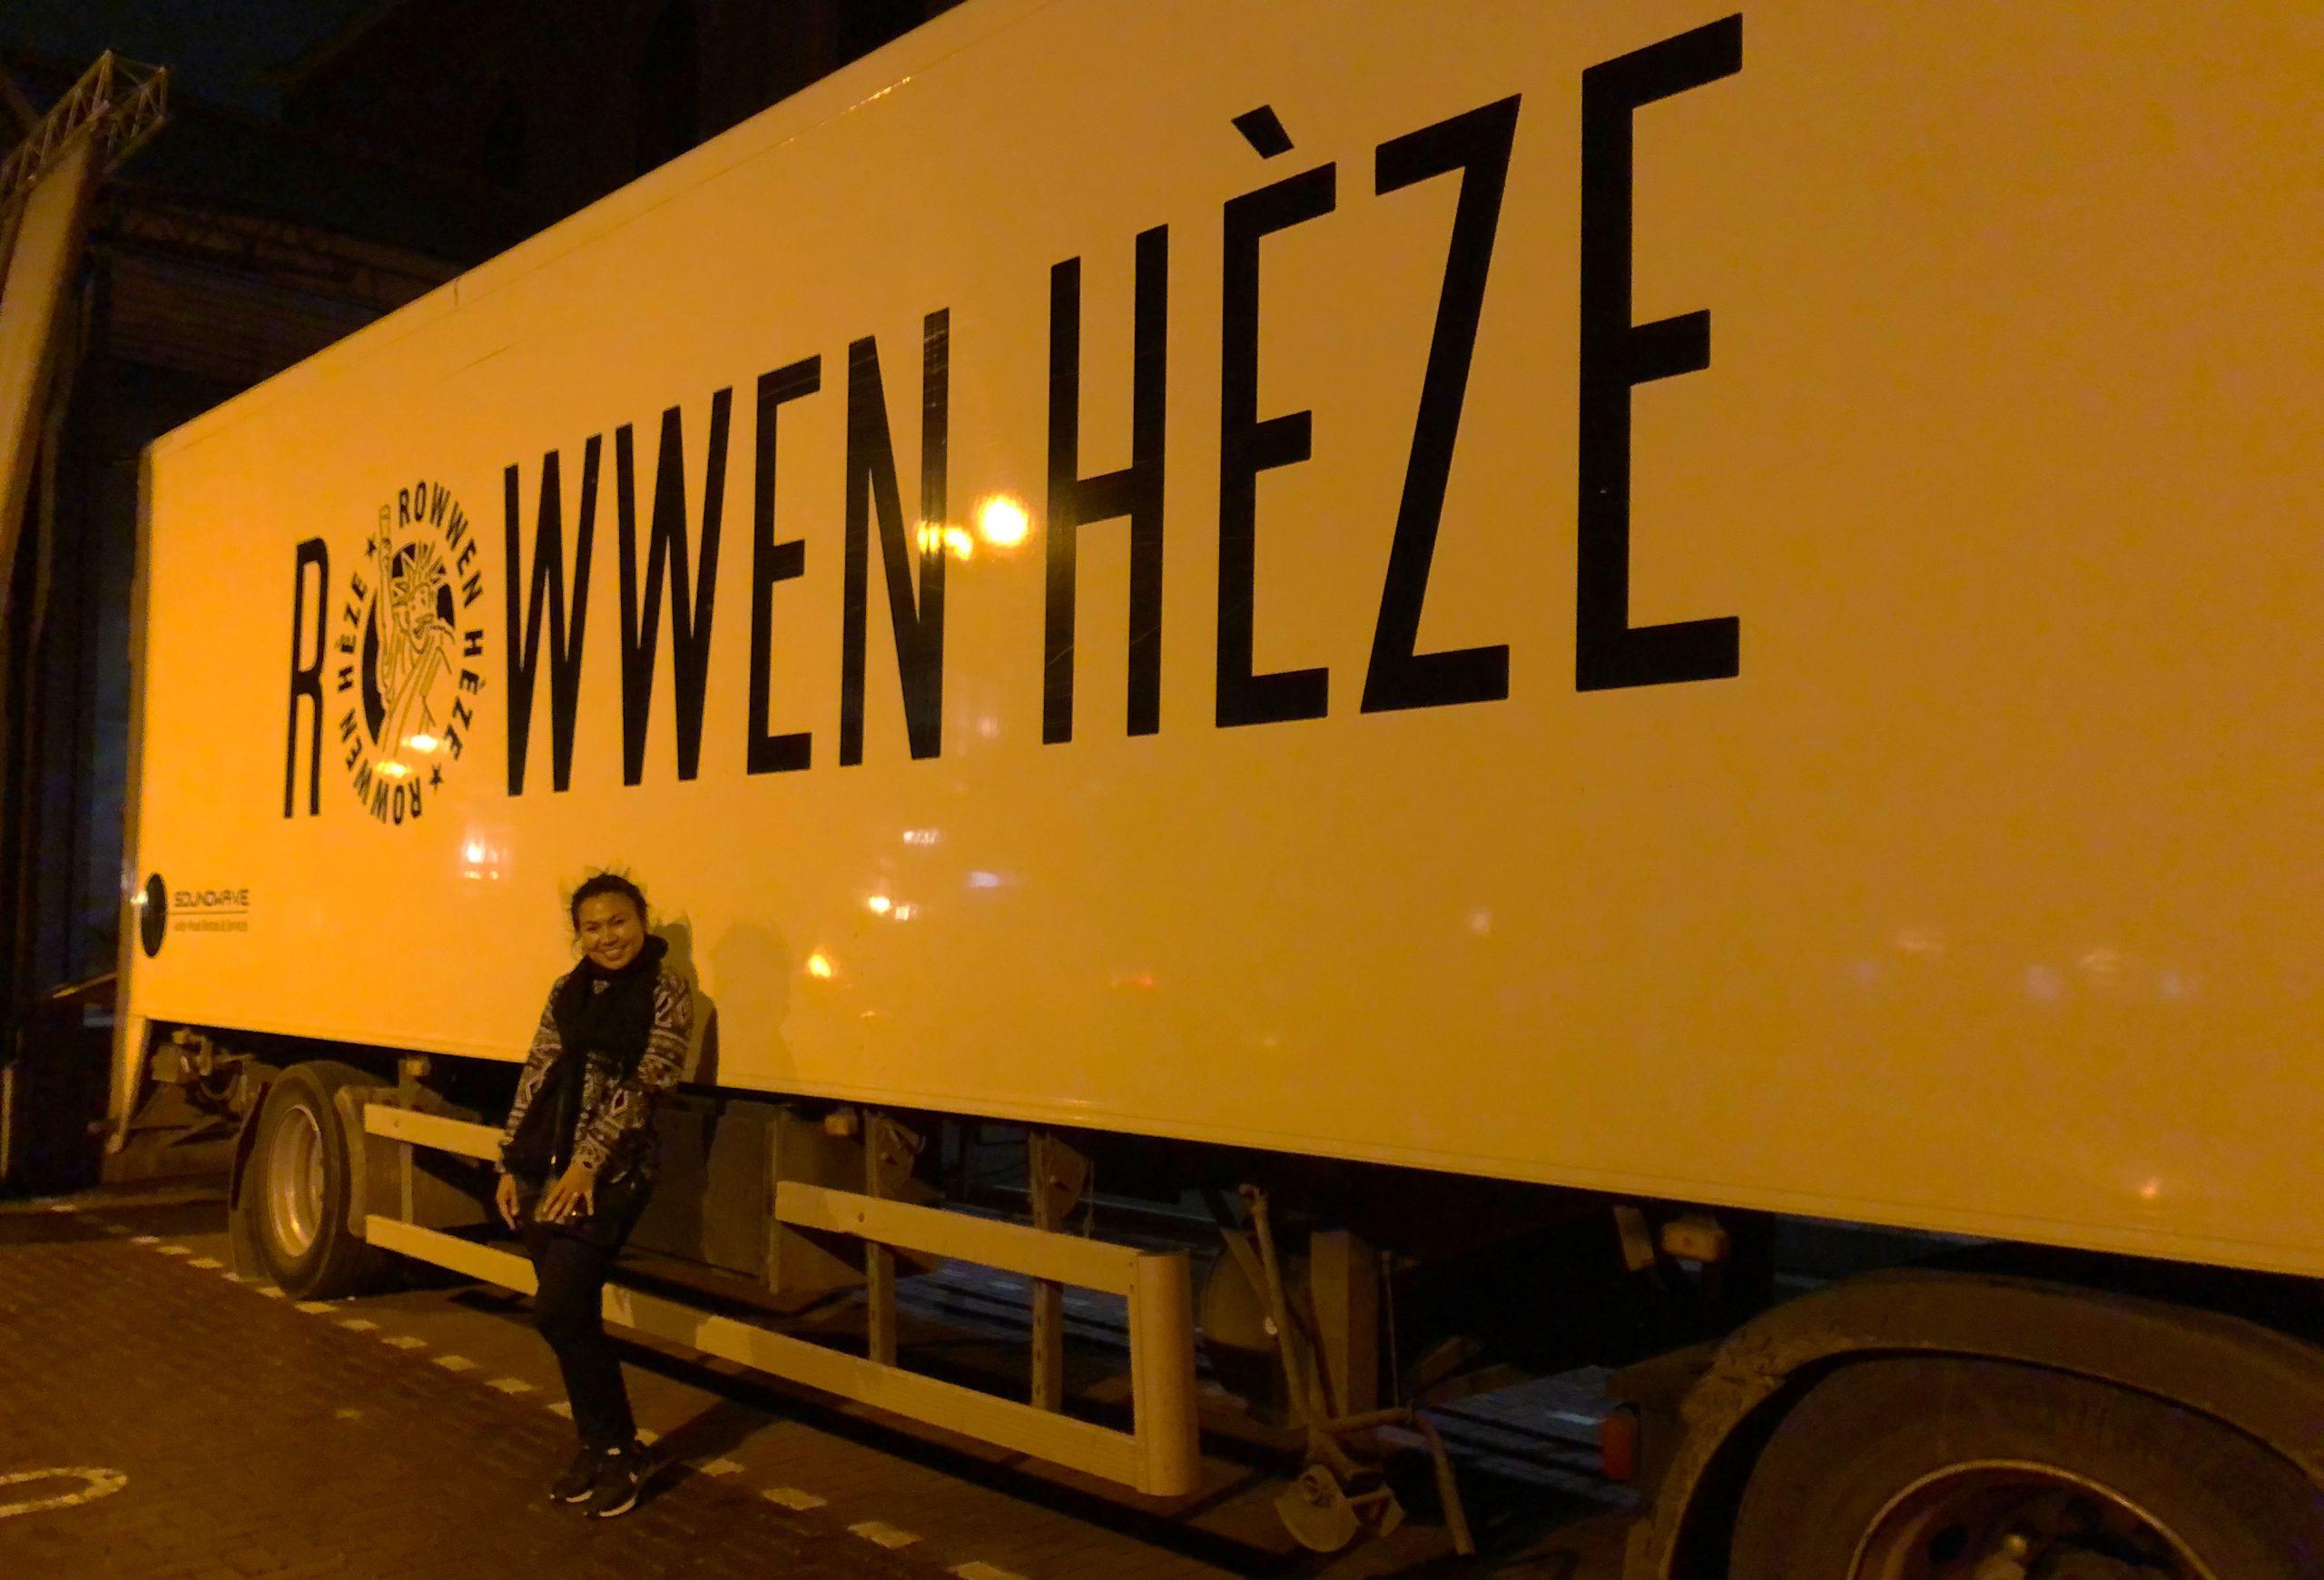 Rowwen Heze Trailer